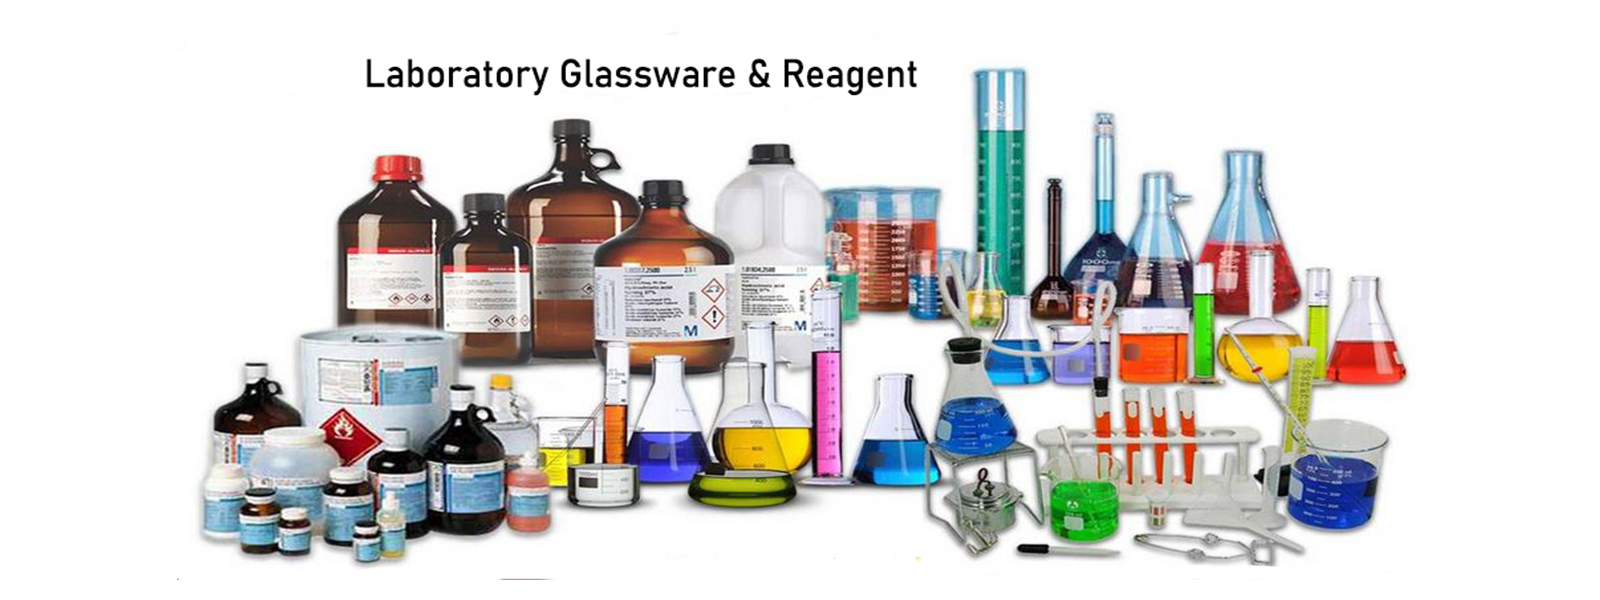 Laboratory Glasswear & Reagent